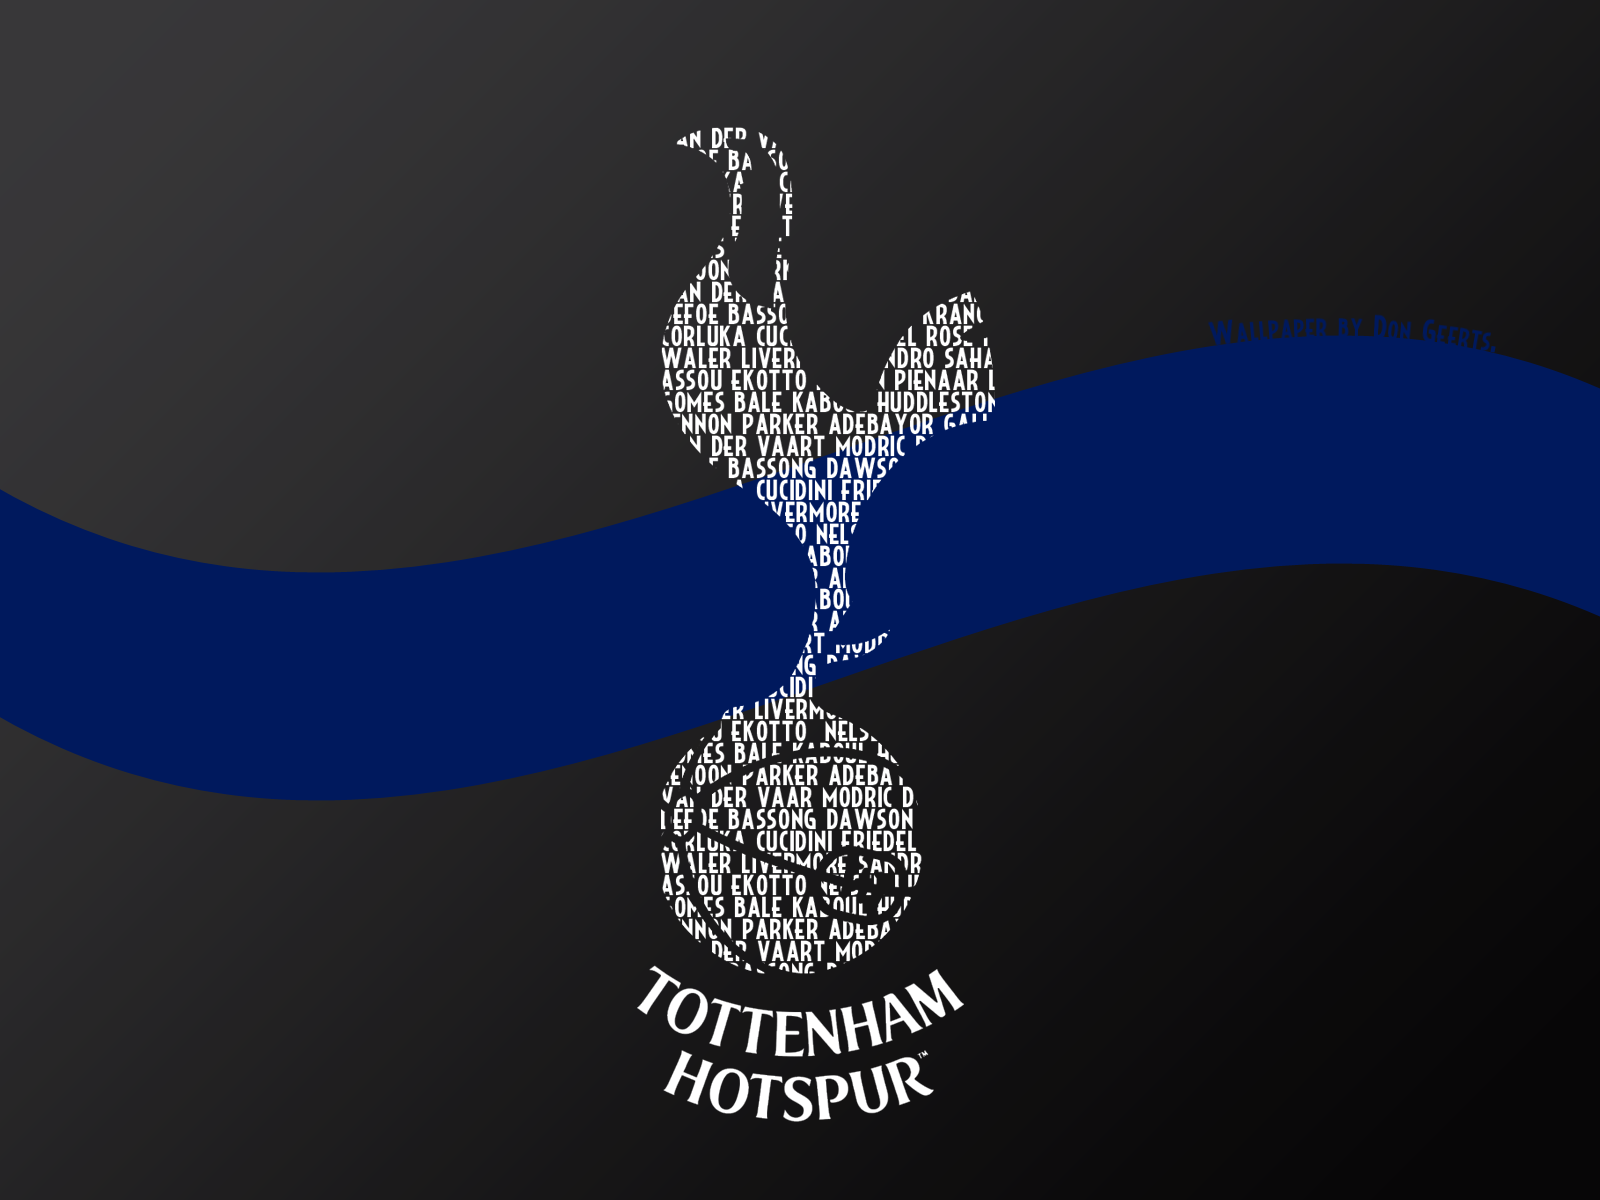 http://4.bp.blogspot.com/-p8h0w77jNAw/UKOmYnnDexI/AAAAAAABdyw/E0wXeyPFC4A/s1600/Tottenham_Logo15.png